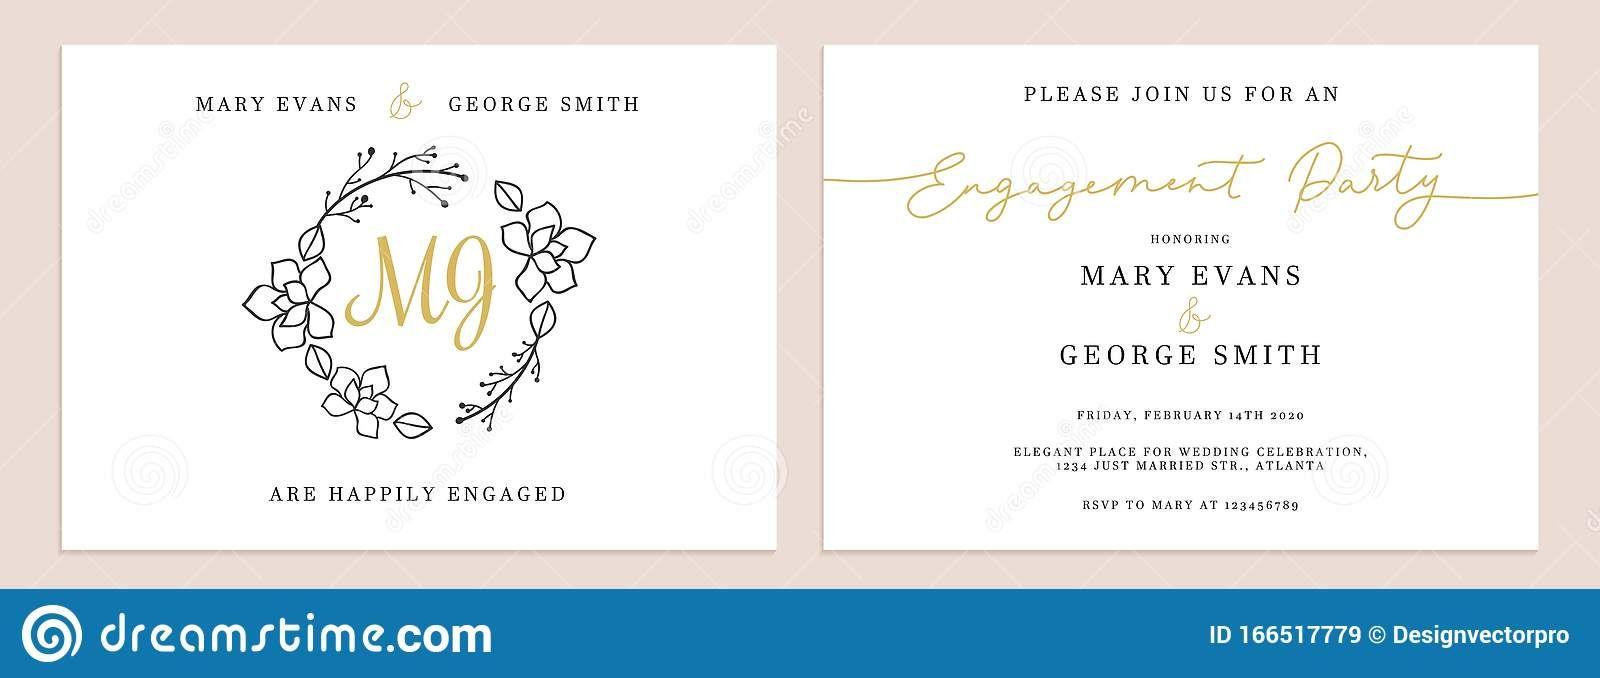 Set Of Wedding Invitation Cards Design Templates Stock With Regard To Celebrate It Templates Place Invitation Card Design Wedding Invitation Cards Card Design